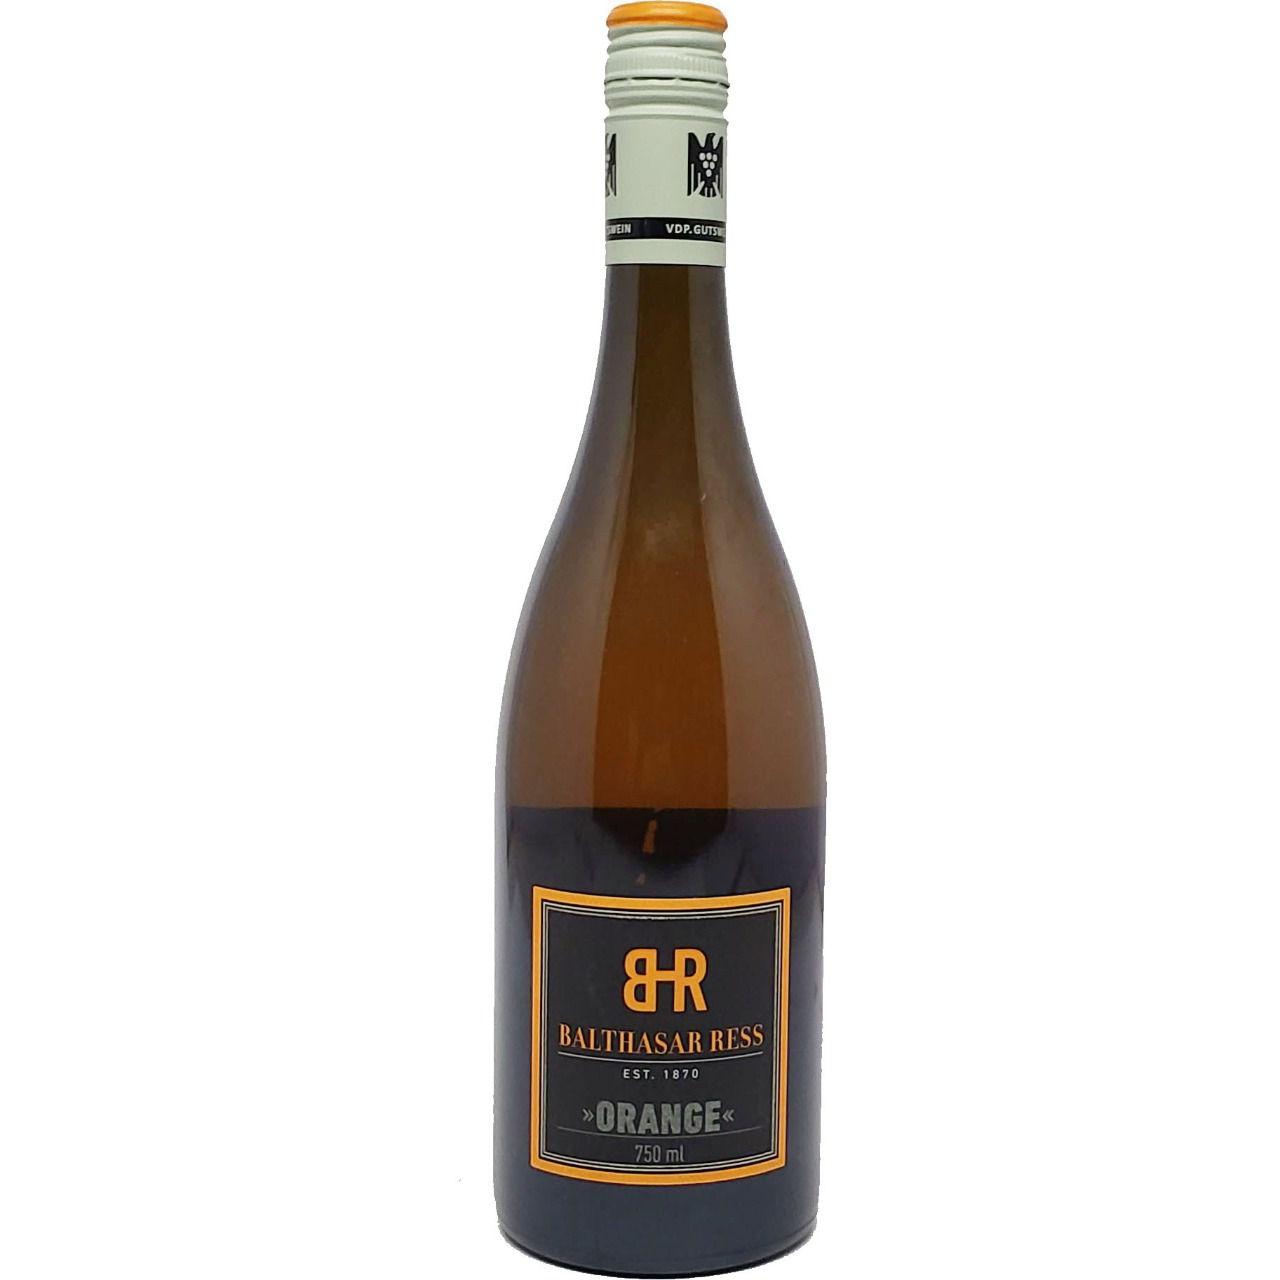 Vinho Branco Balthasar Ress Orange Trocken  - 750ml -